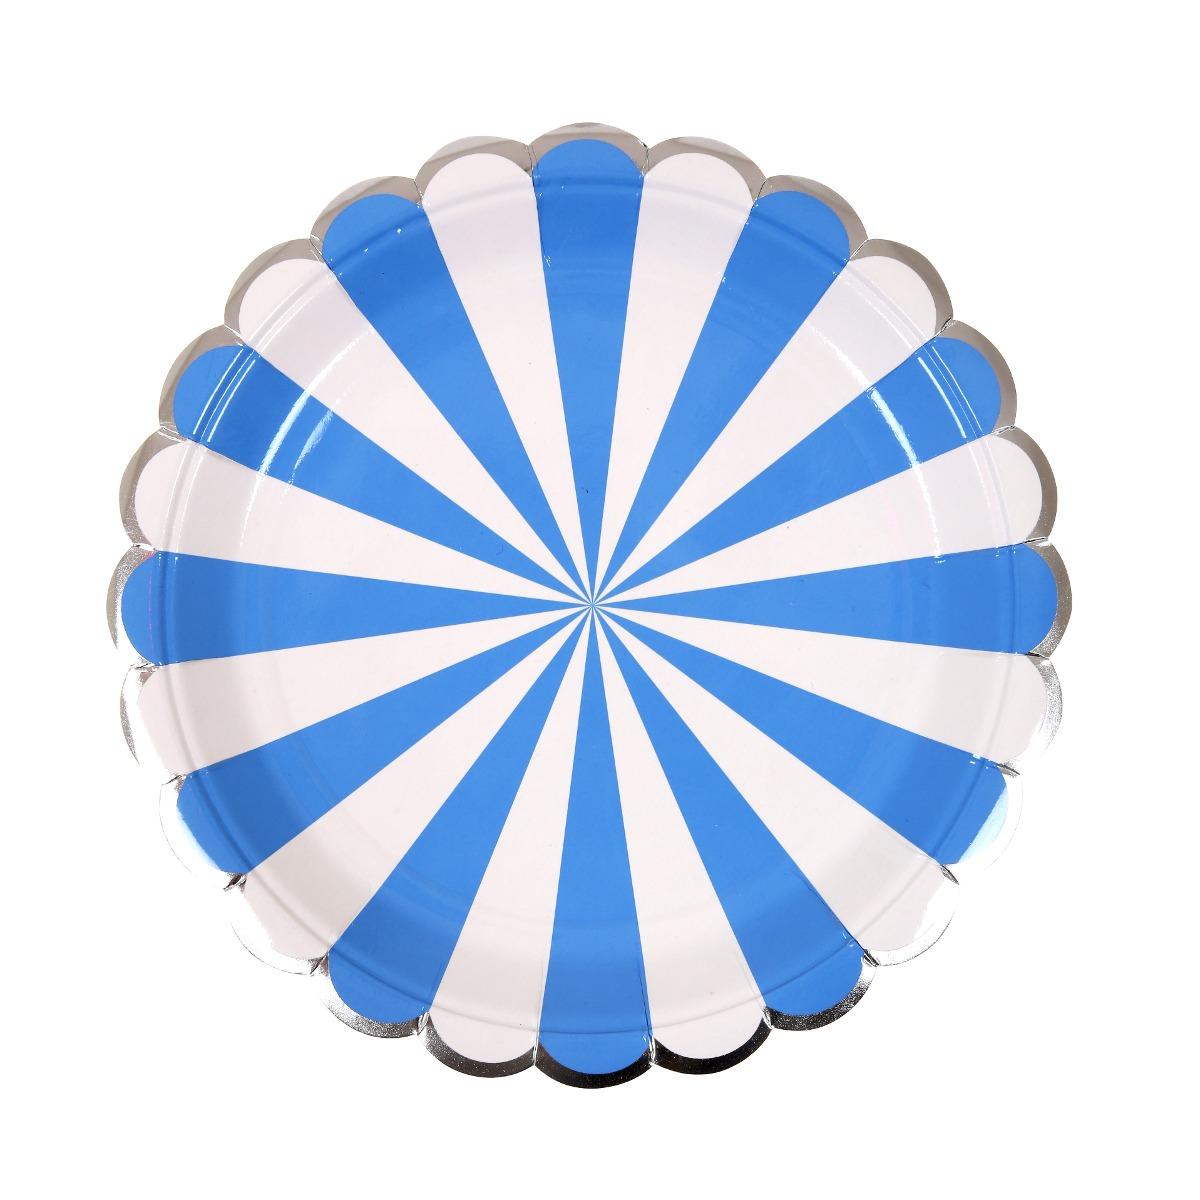 Platos Stripe Azul chicos